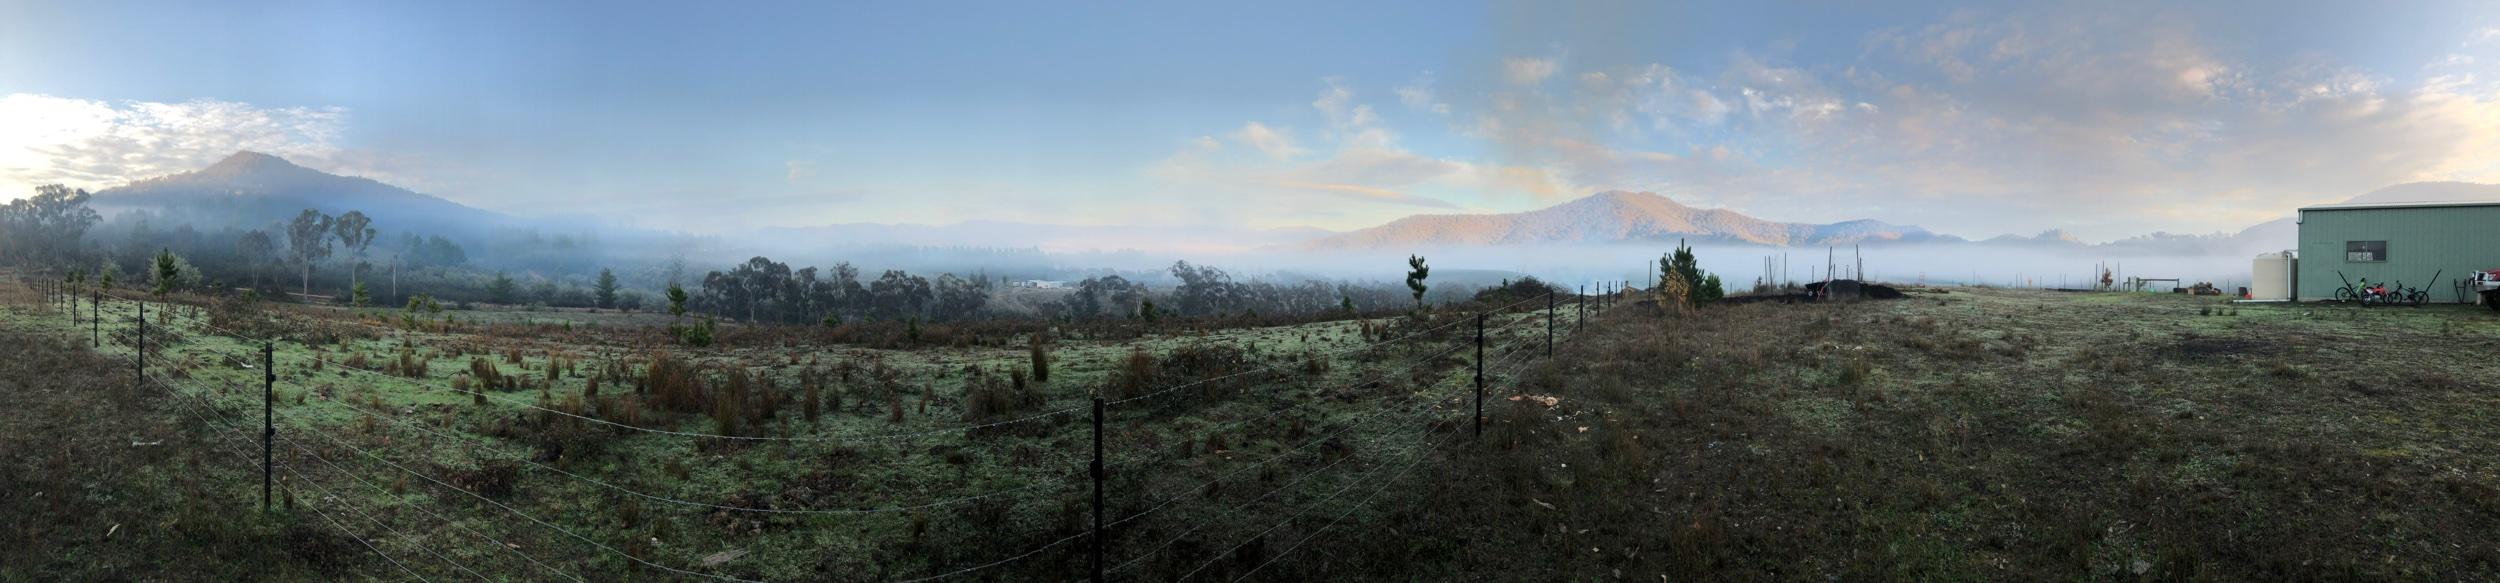 A wintery morning - Macs Cove - Victoria